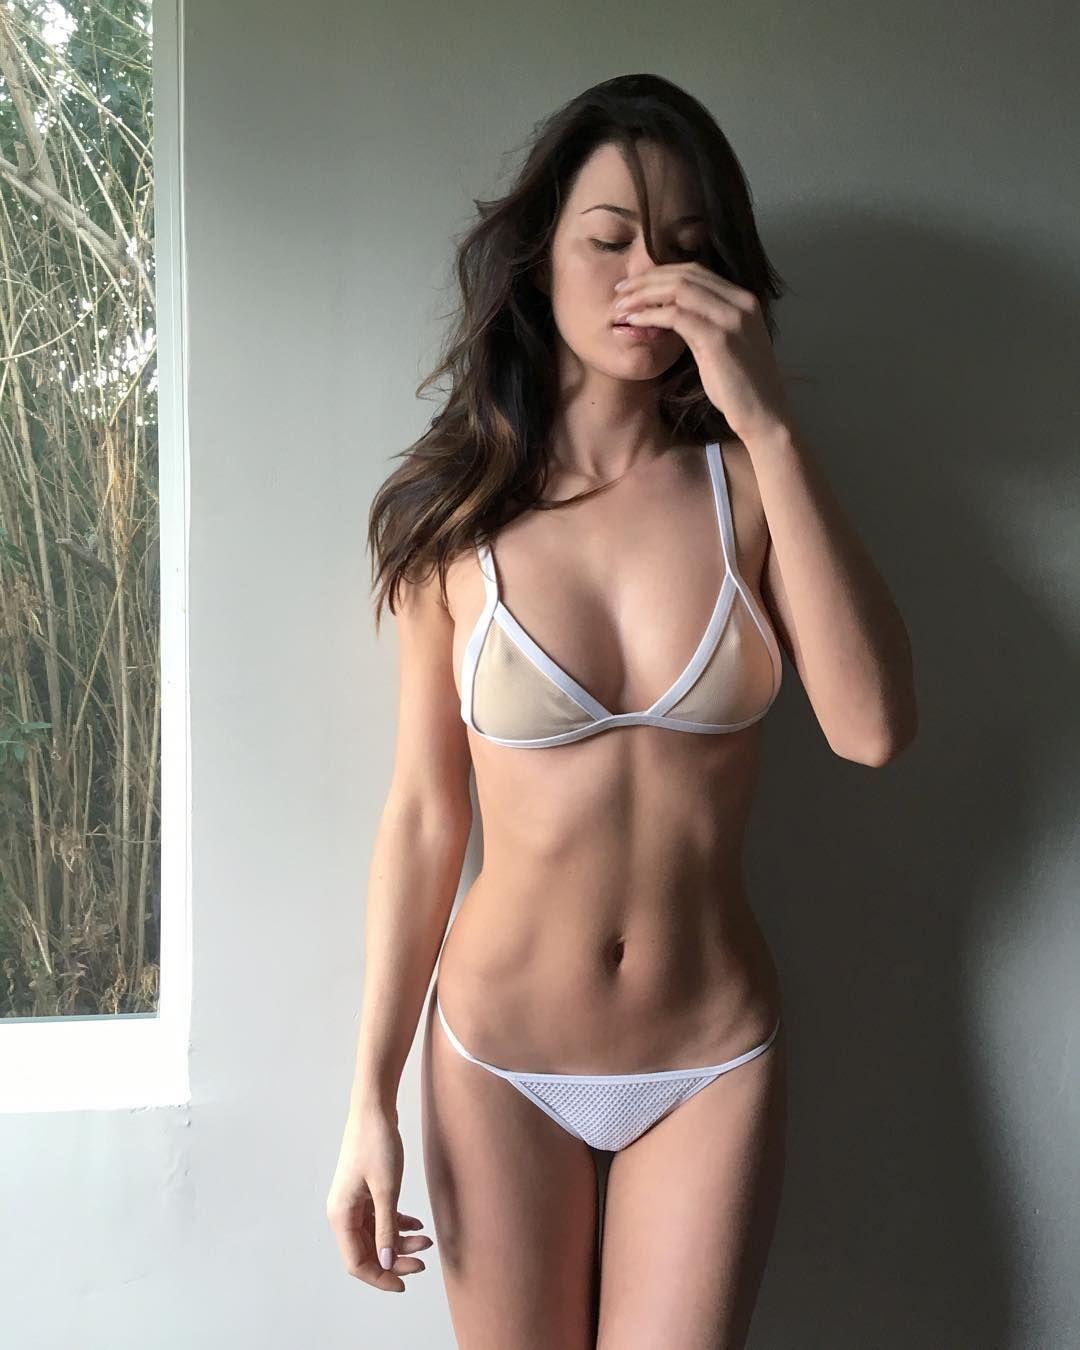 Hot Jenny Watwood naked (89 foto and video), Ass, Paparazzi, Feet, legs 2015